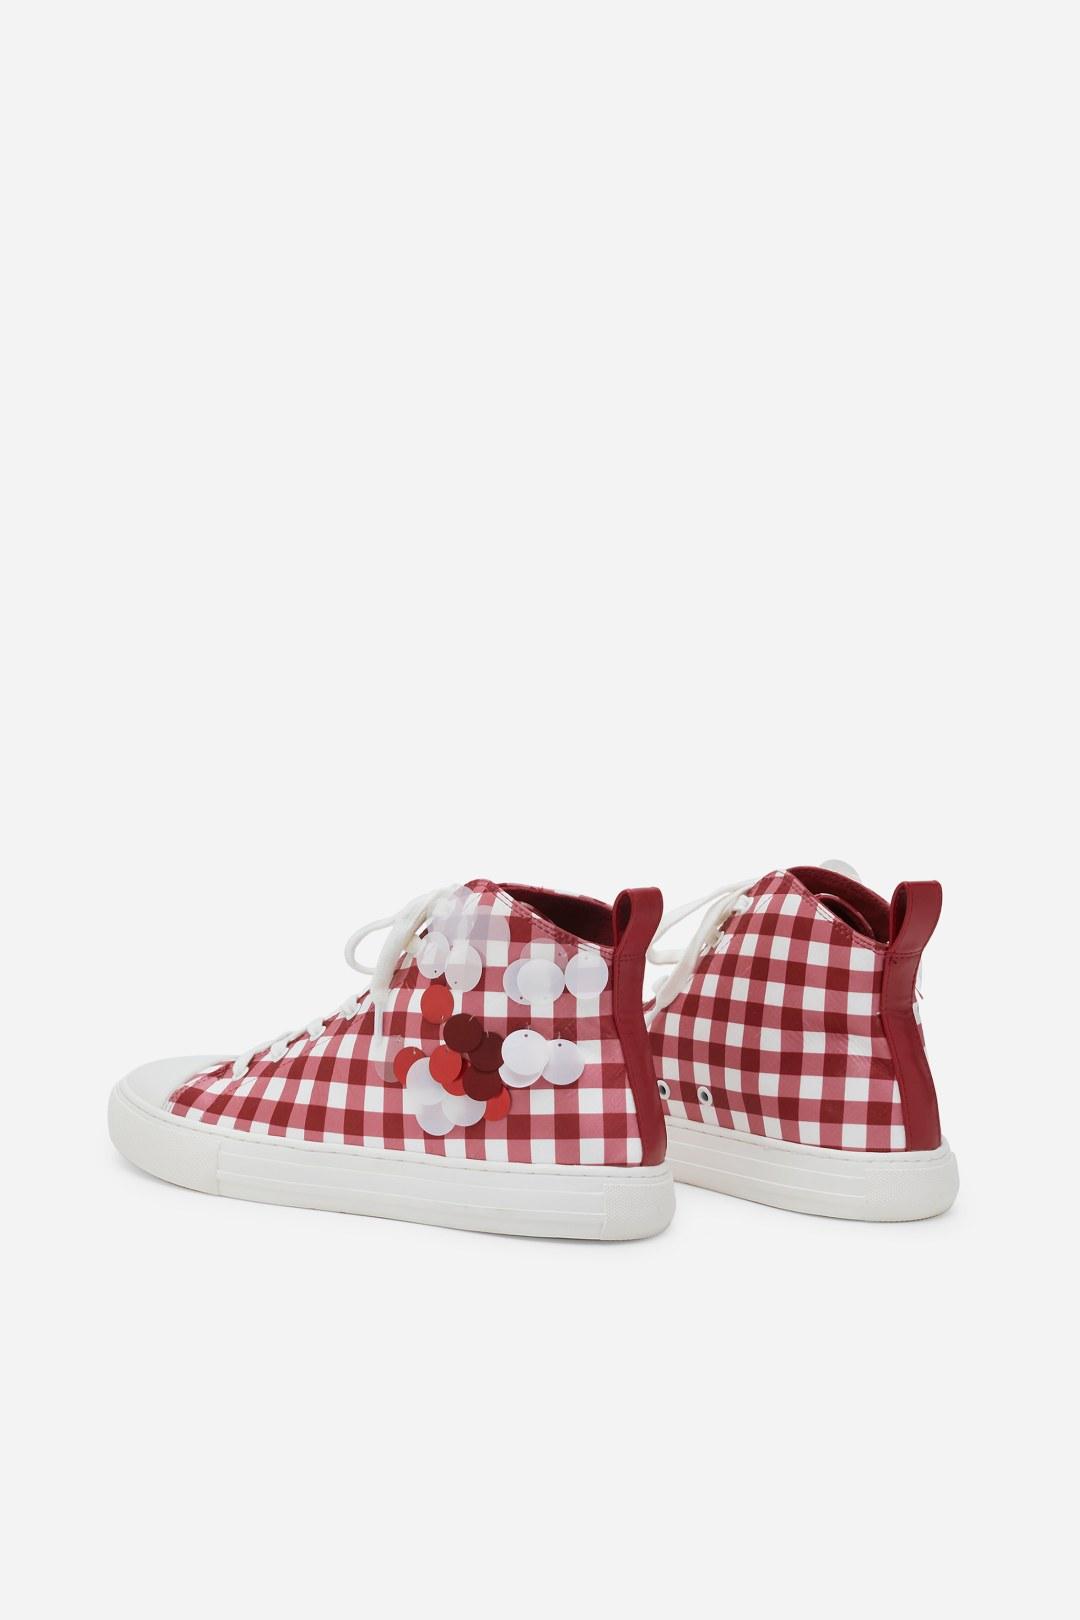 CHARLES KEITH小简约基本款帆布运动鞋小CK1-71700035-A-小ck中文网